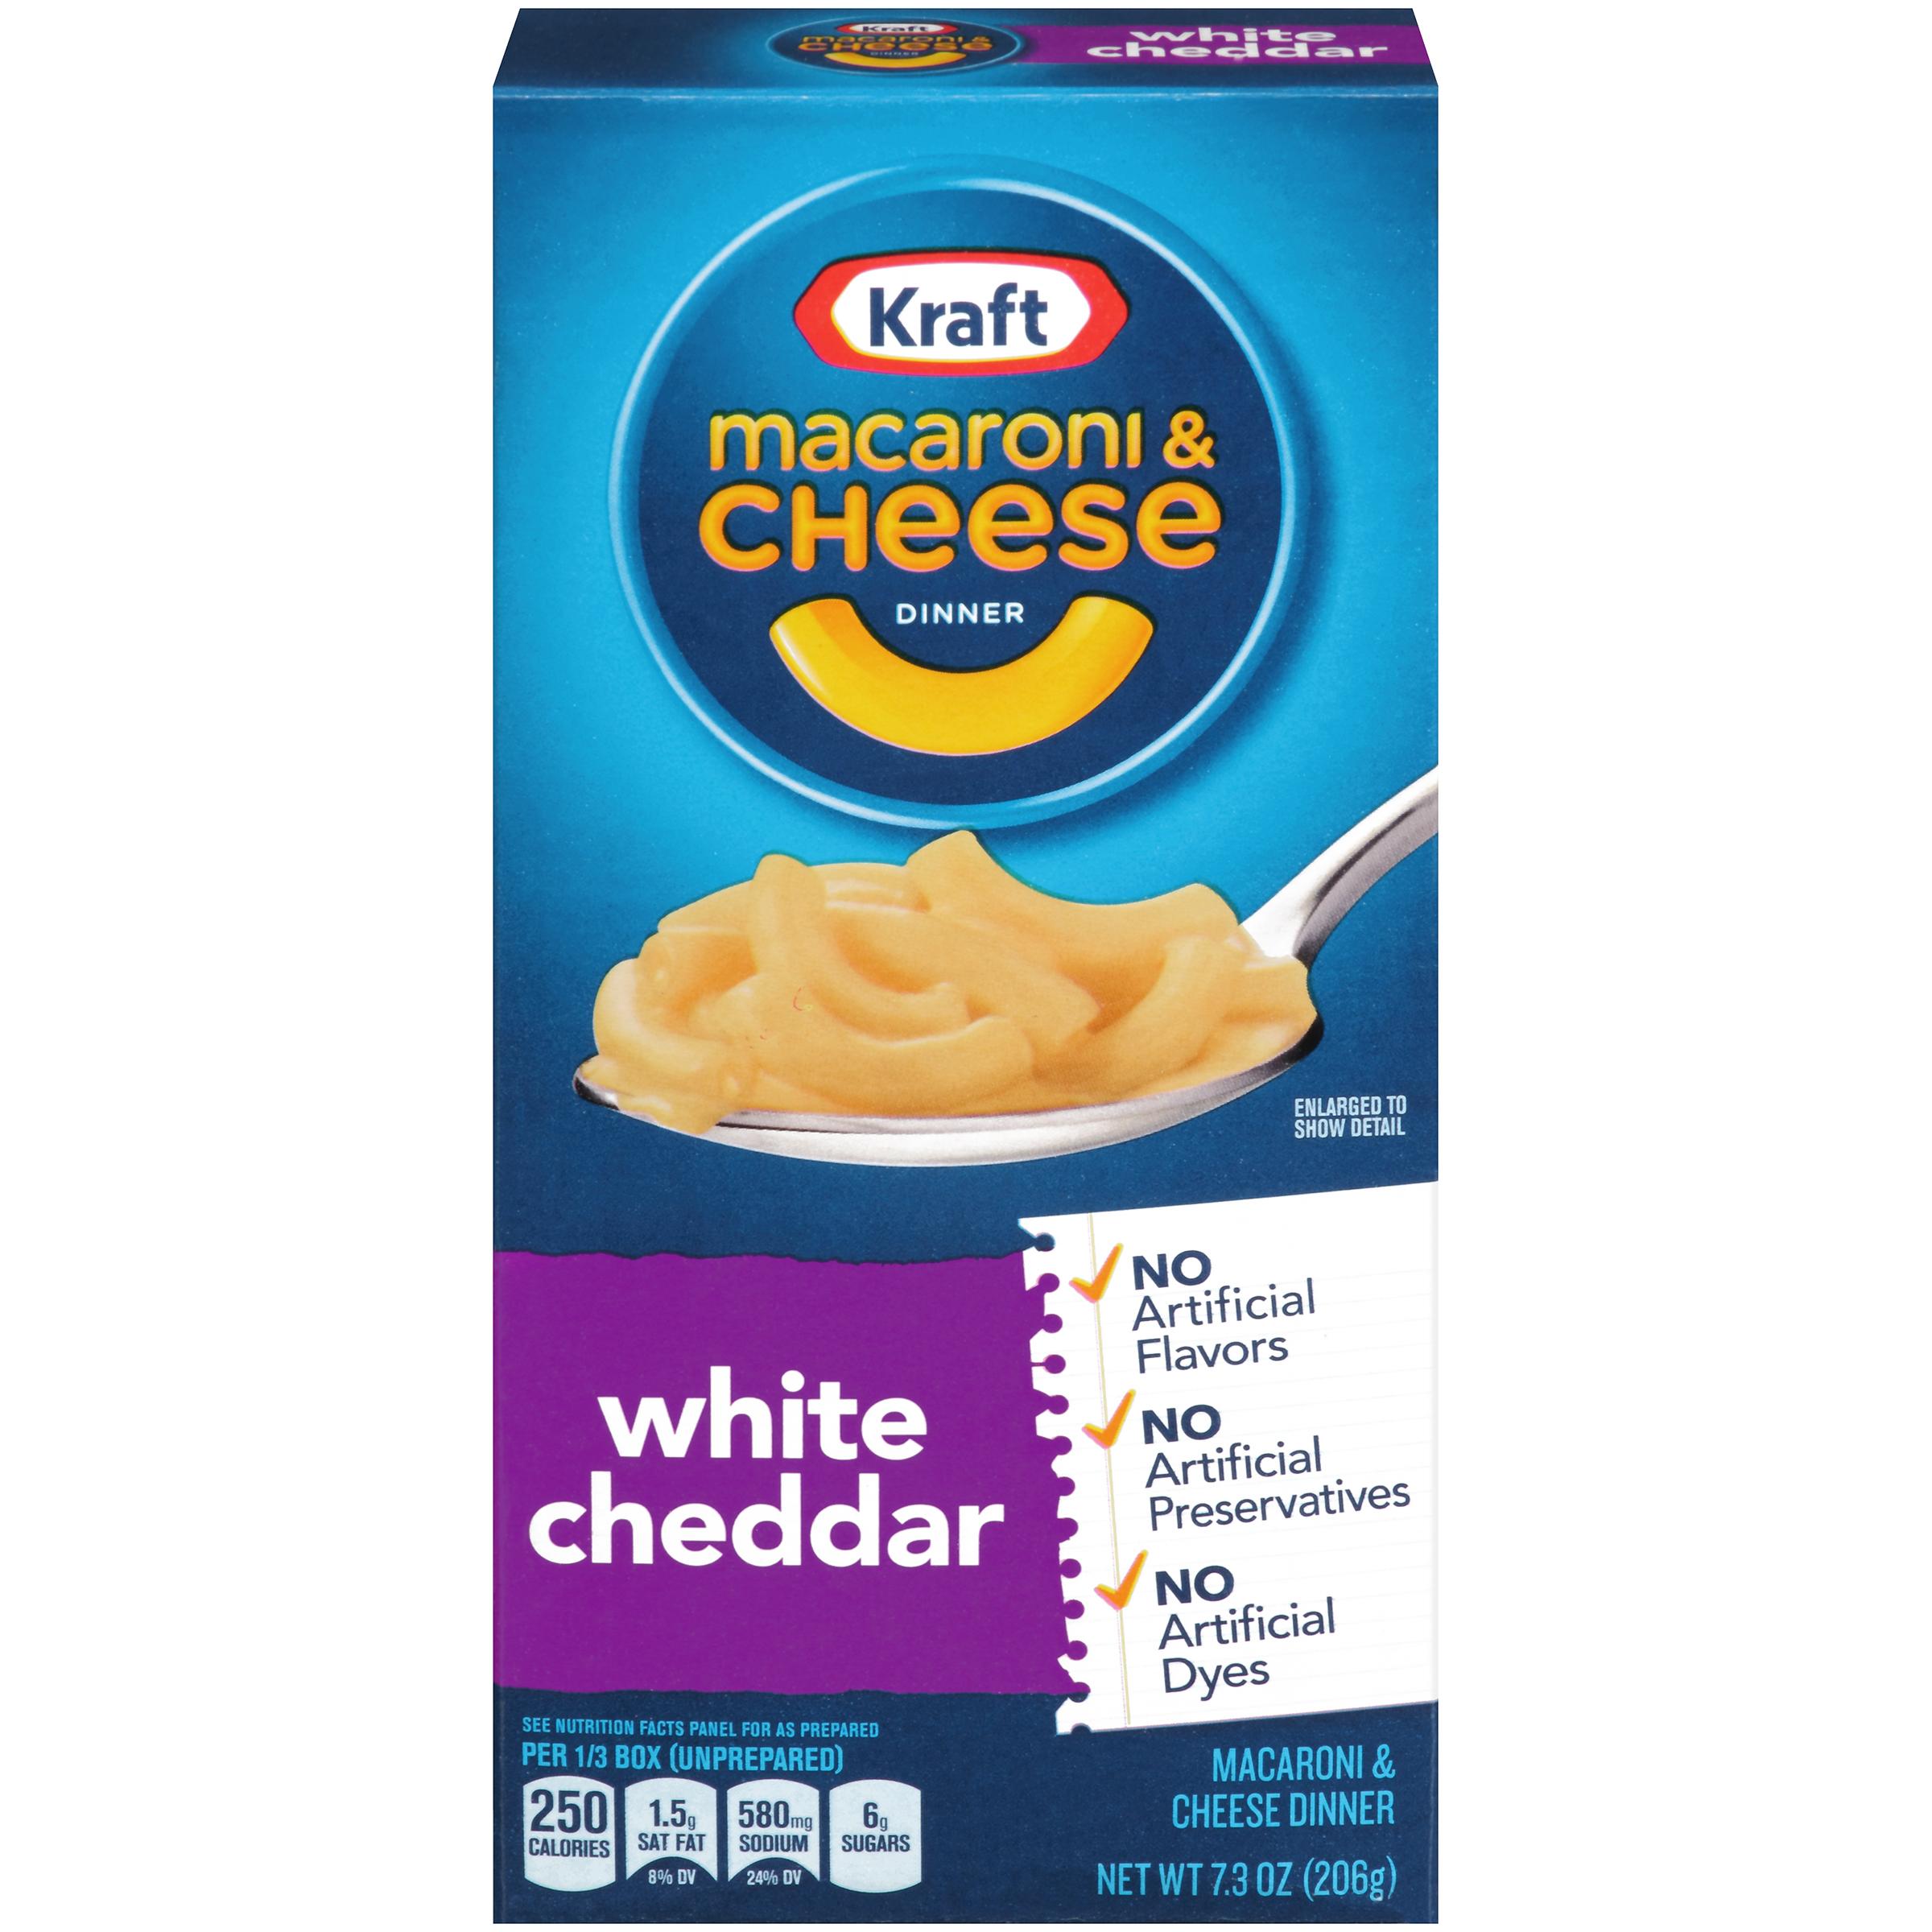 Kraft White Cheddar Macaroni & Cheese Dinner